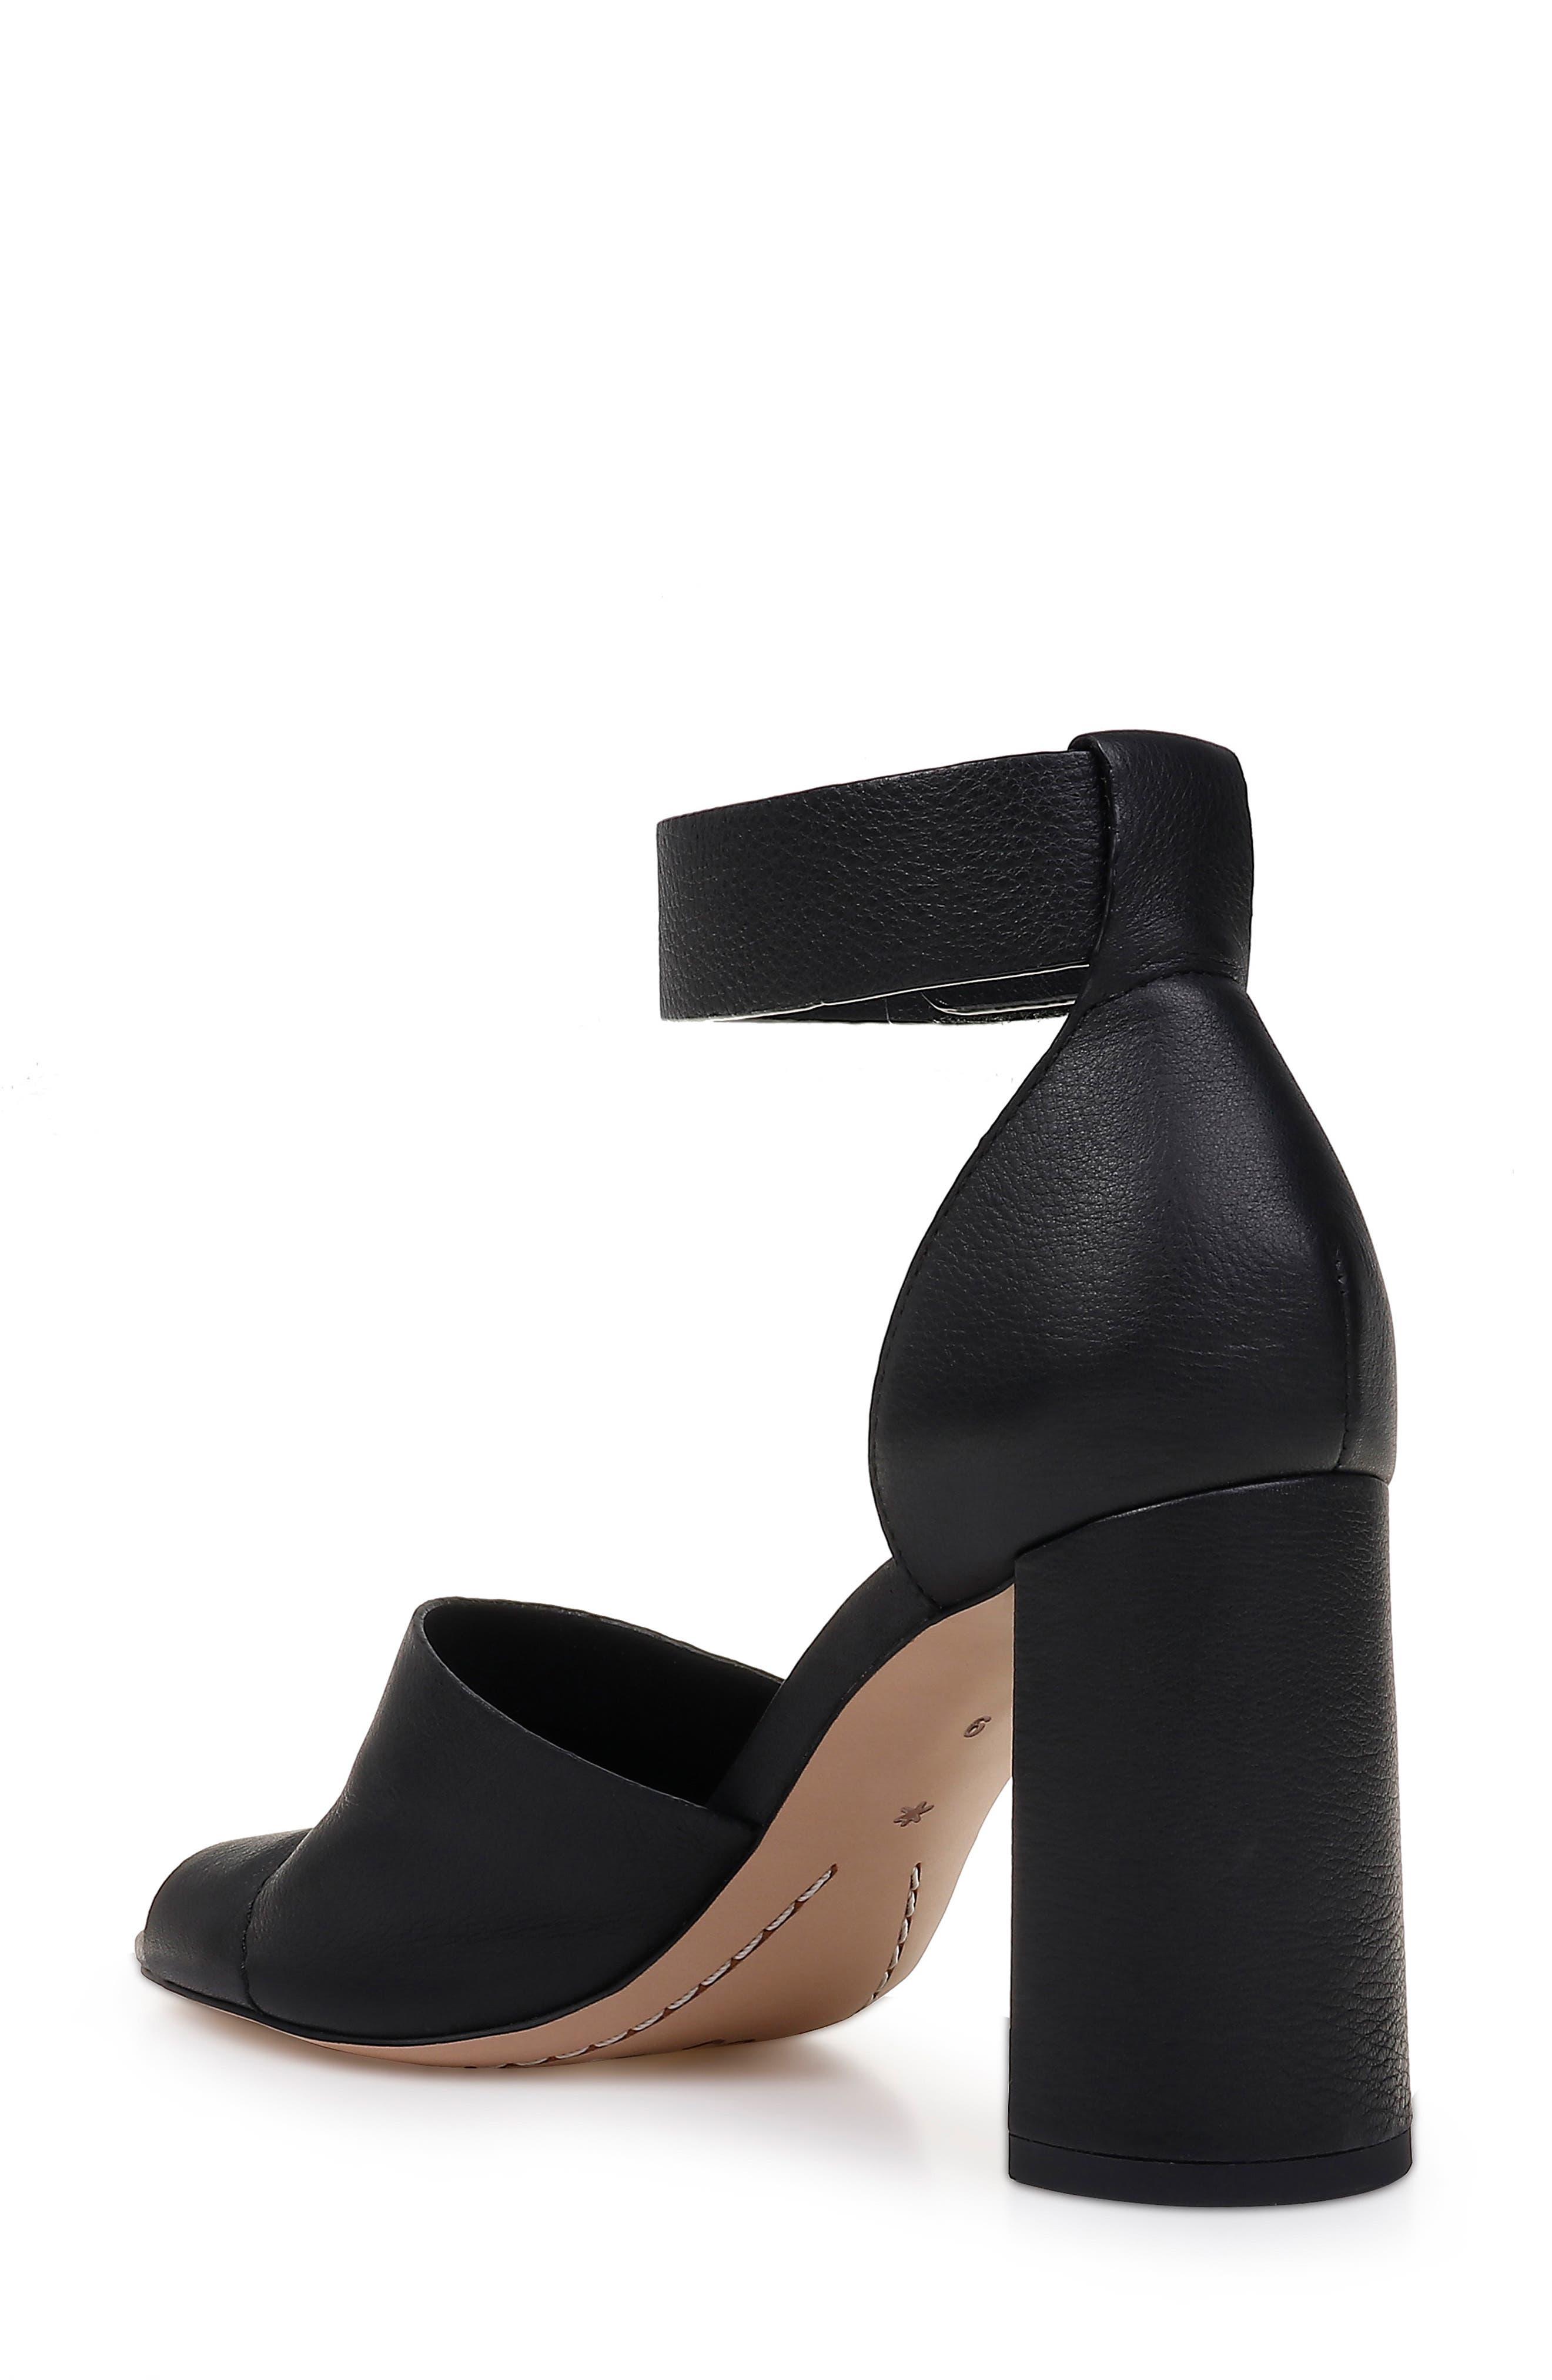 SPLENDID, Thandie Ankle Strap Sandal, Alternate thumbnail 2, color, BLACK NUBUCK LEATHER